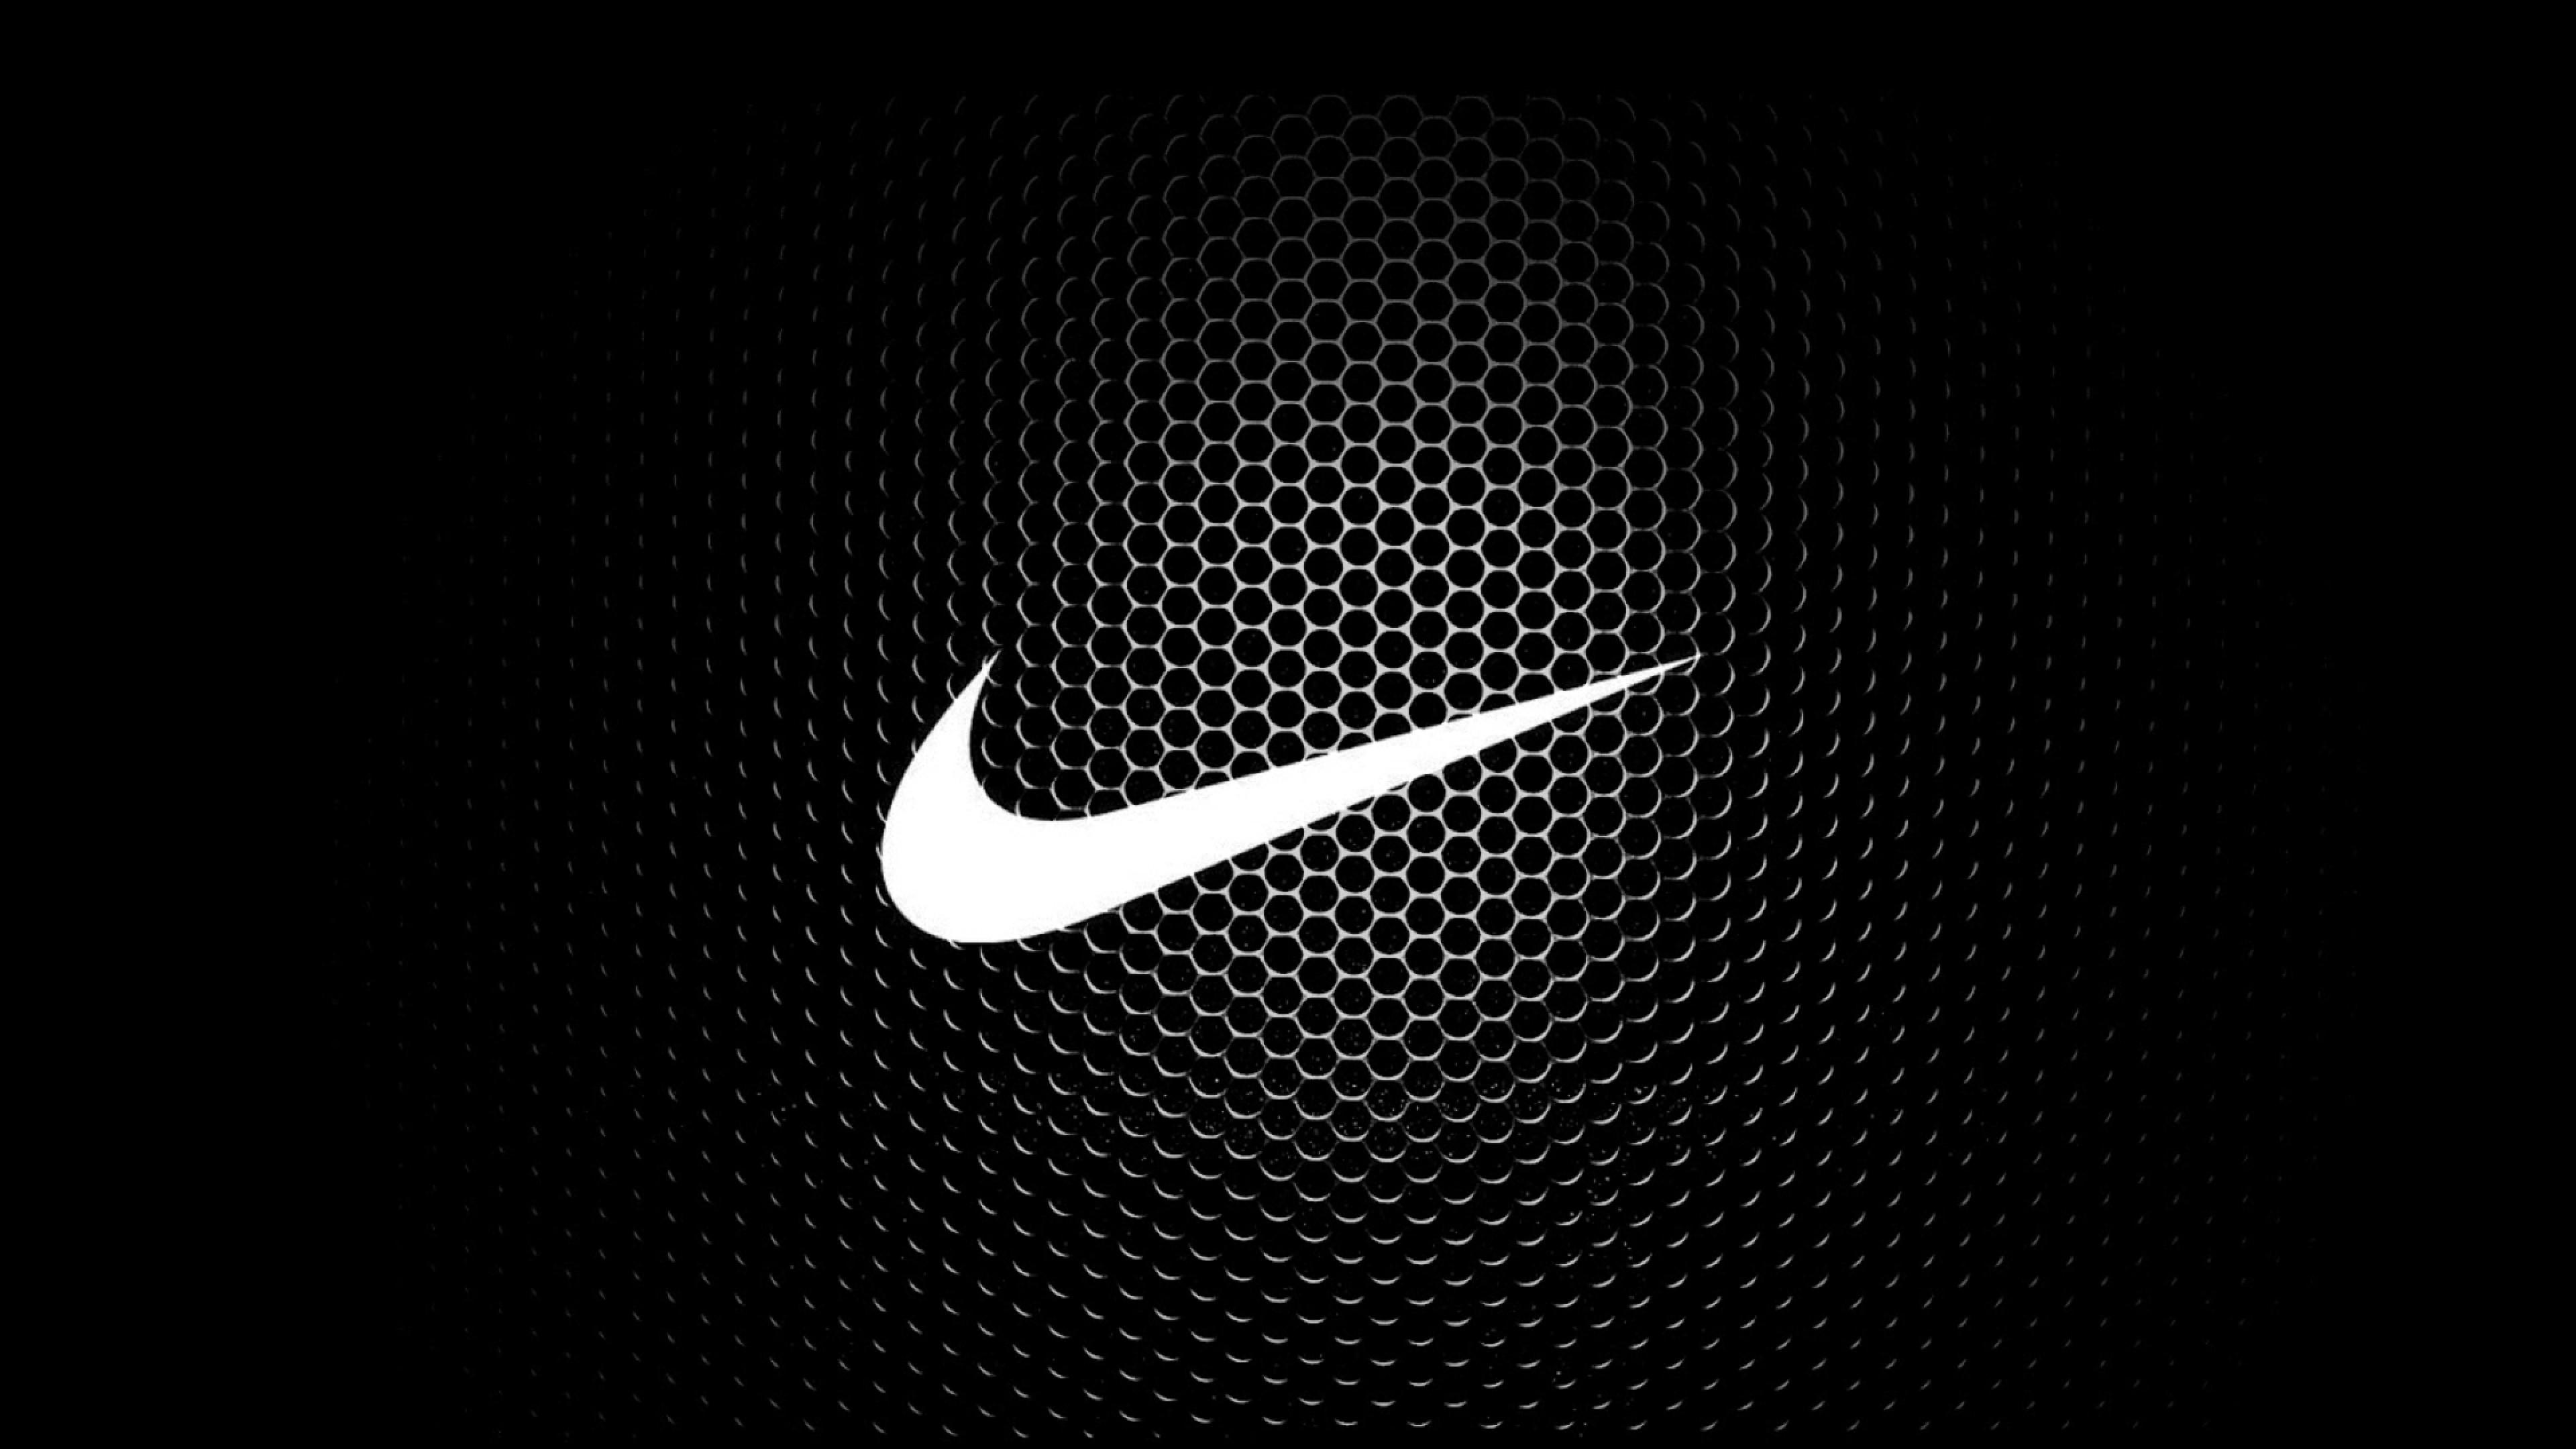 Cool Nike Logo High Resolution Full Hd Background Wallpaper For